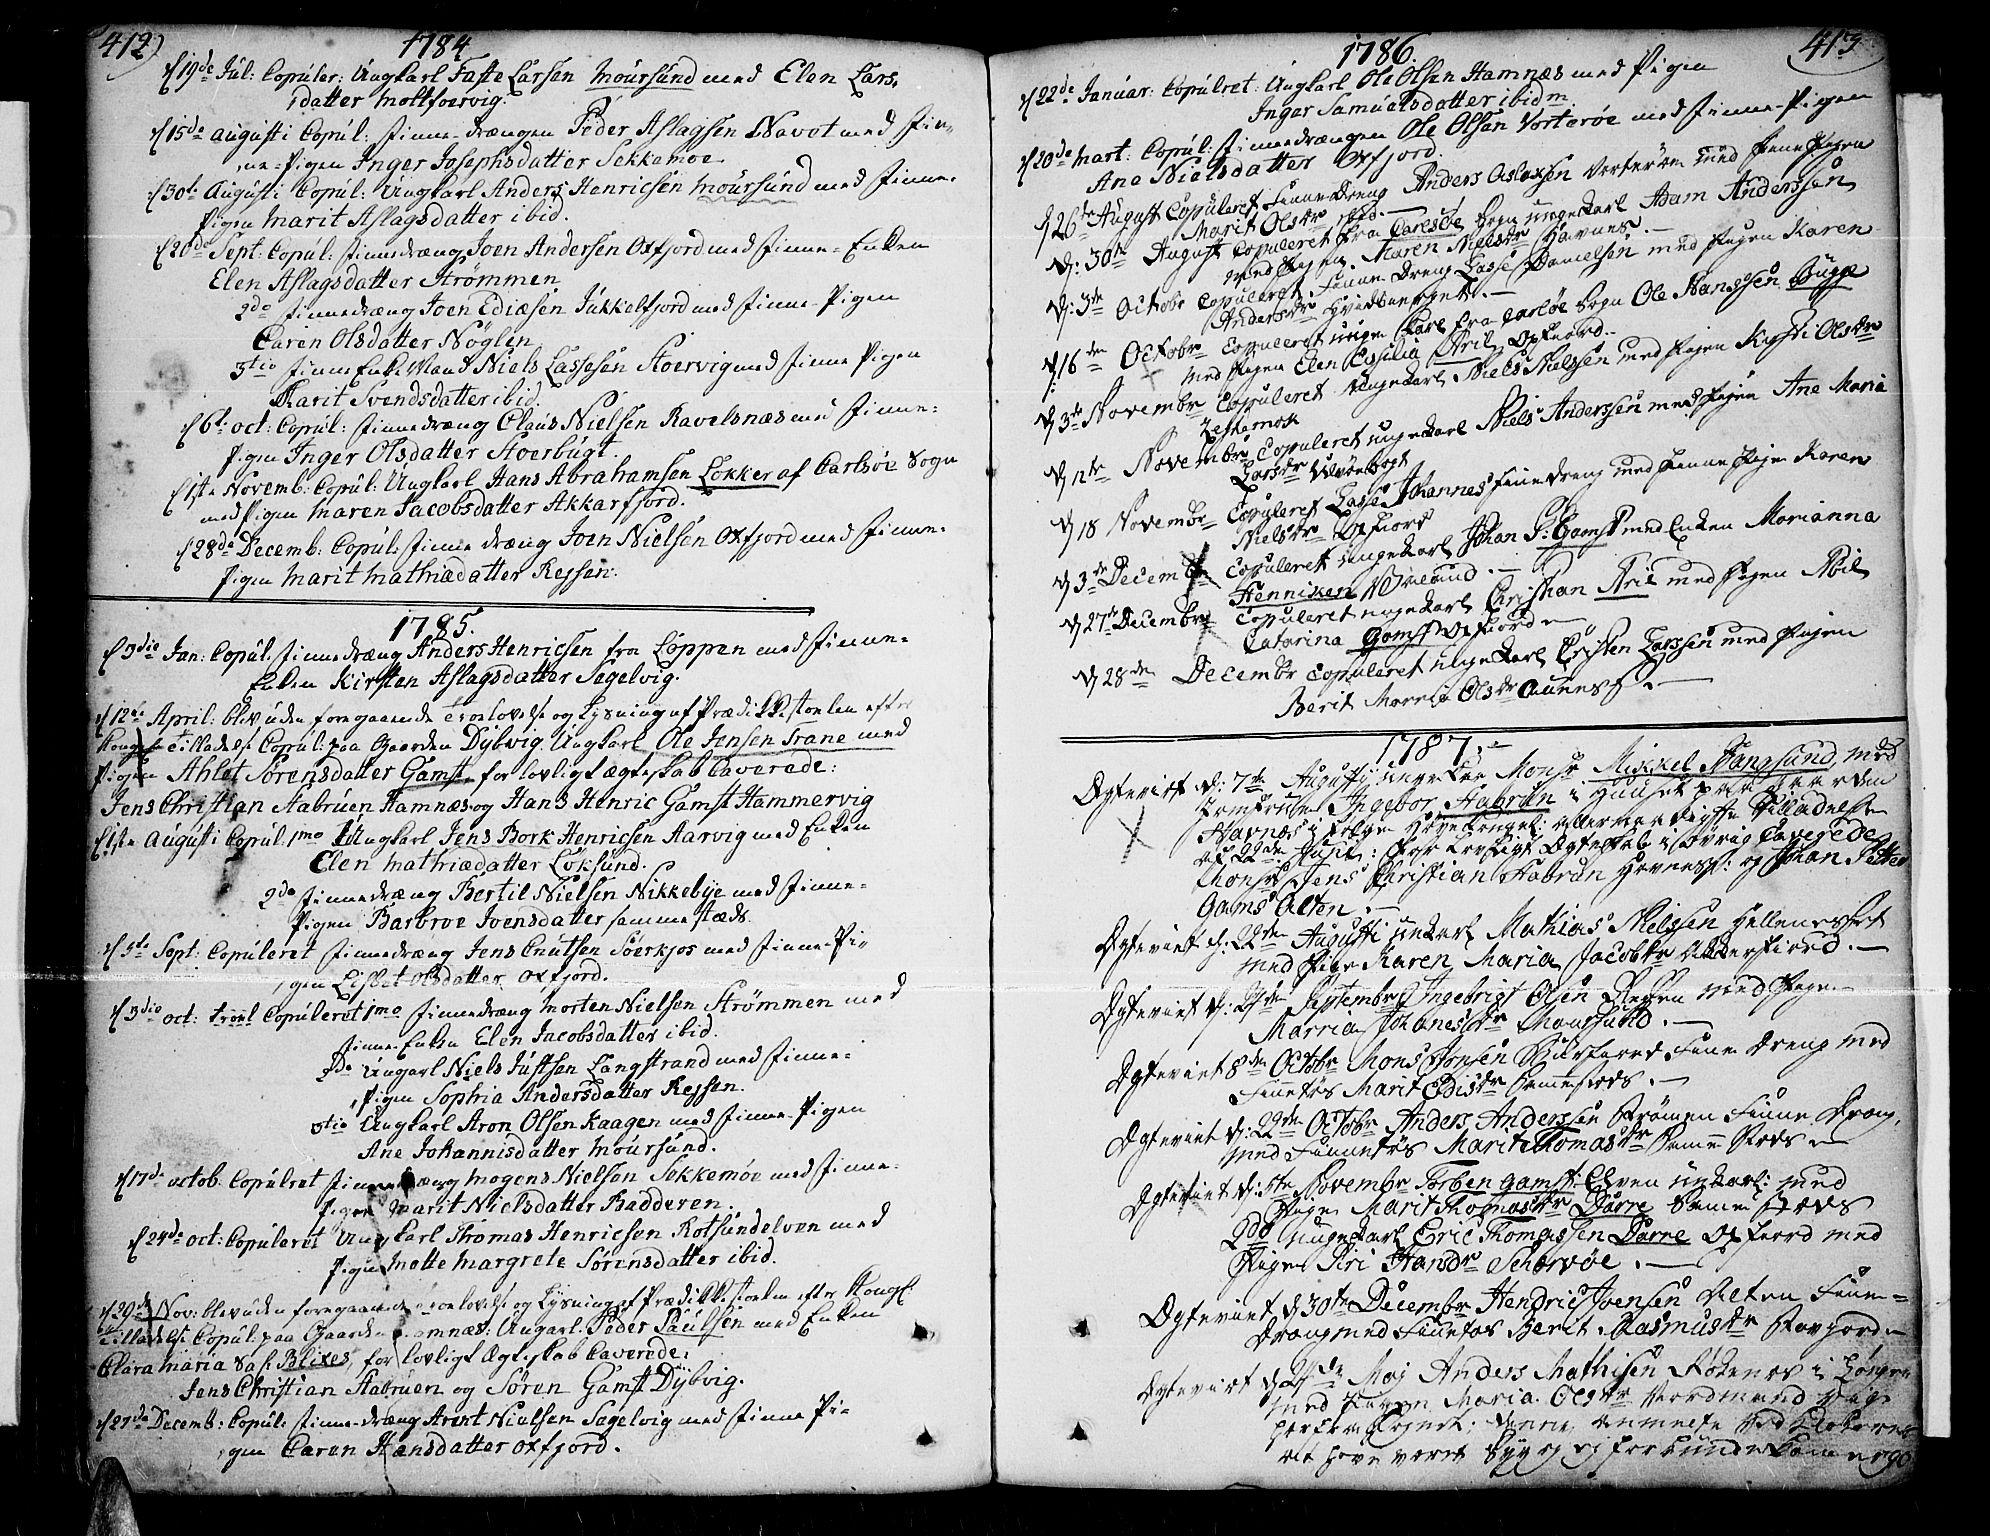 SATØ, Skjervøy sokneprestkontor, H/Ha/Haa/L0002kirke: Ministerialbok nr. 2, 1781-1817, s. 412-413